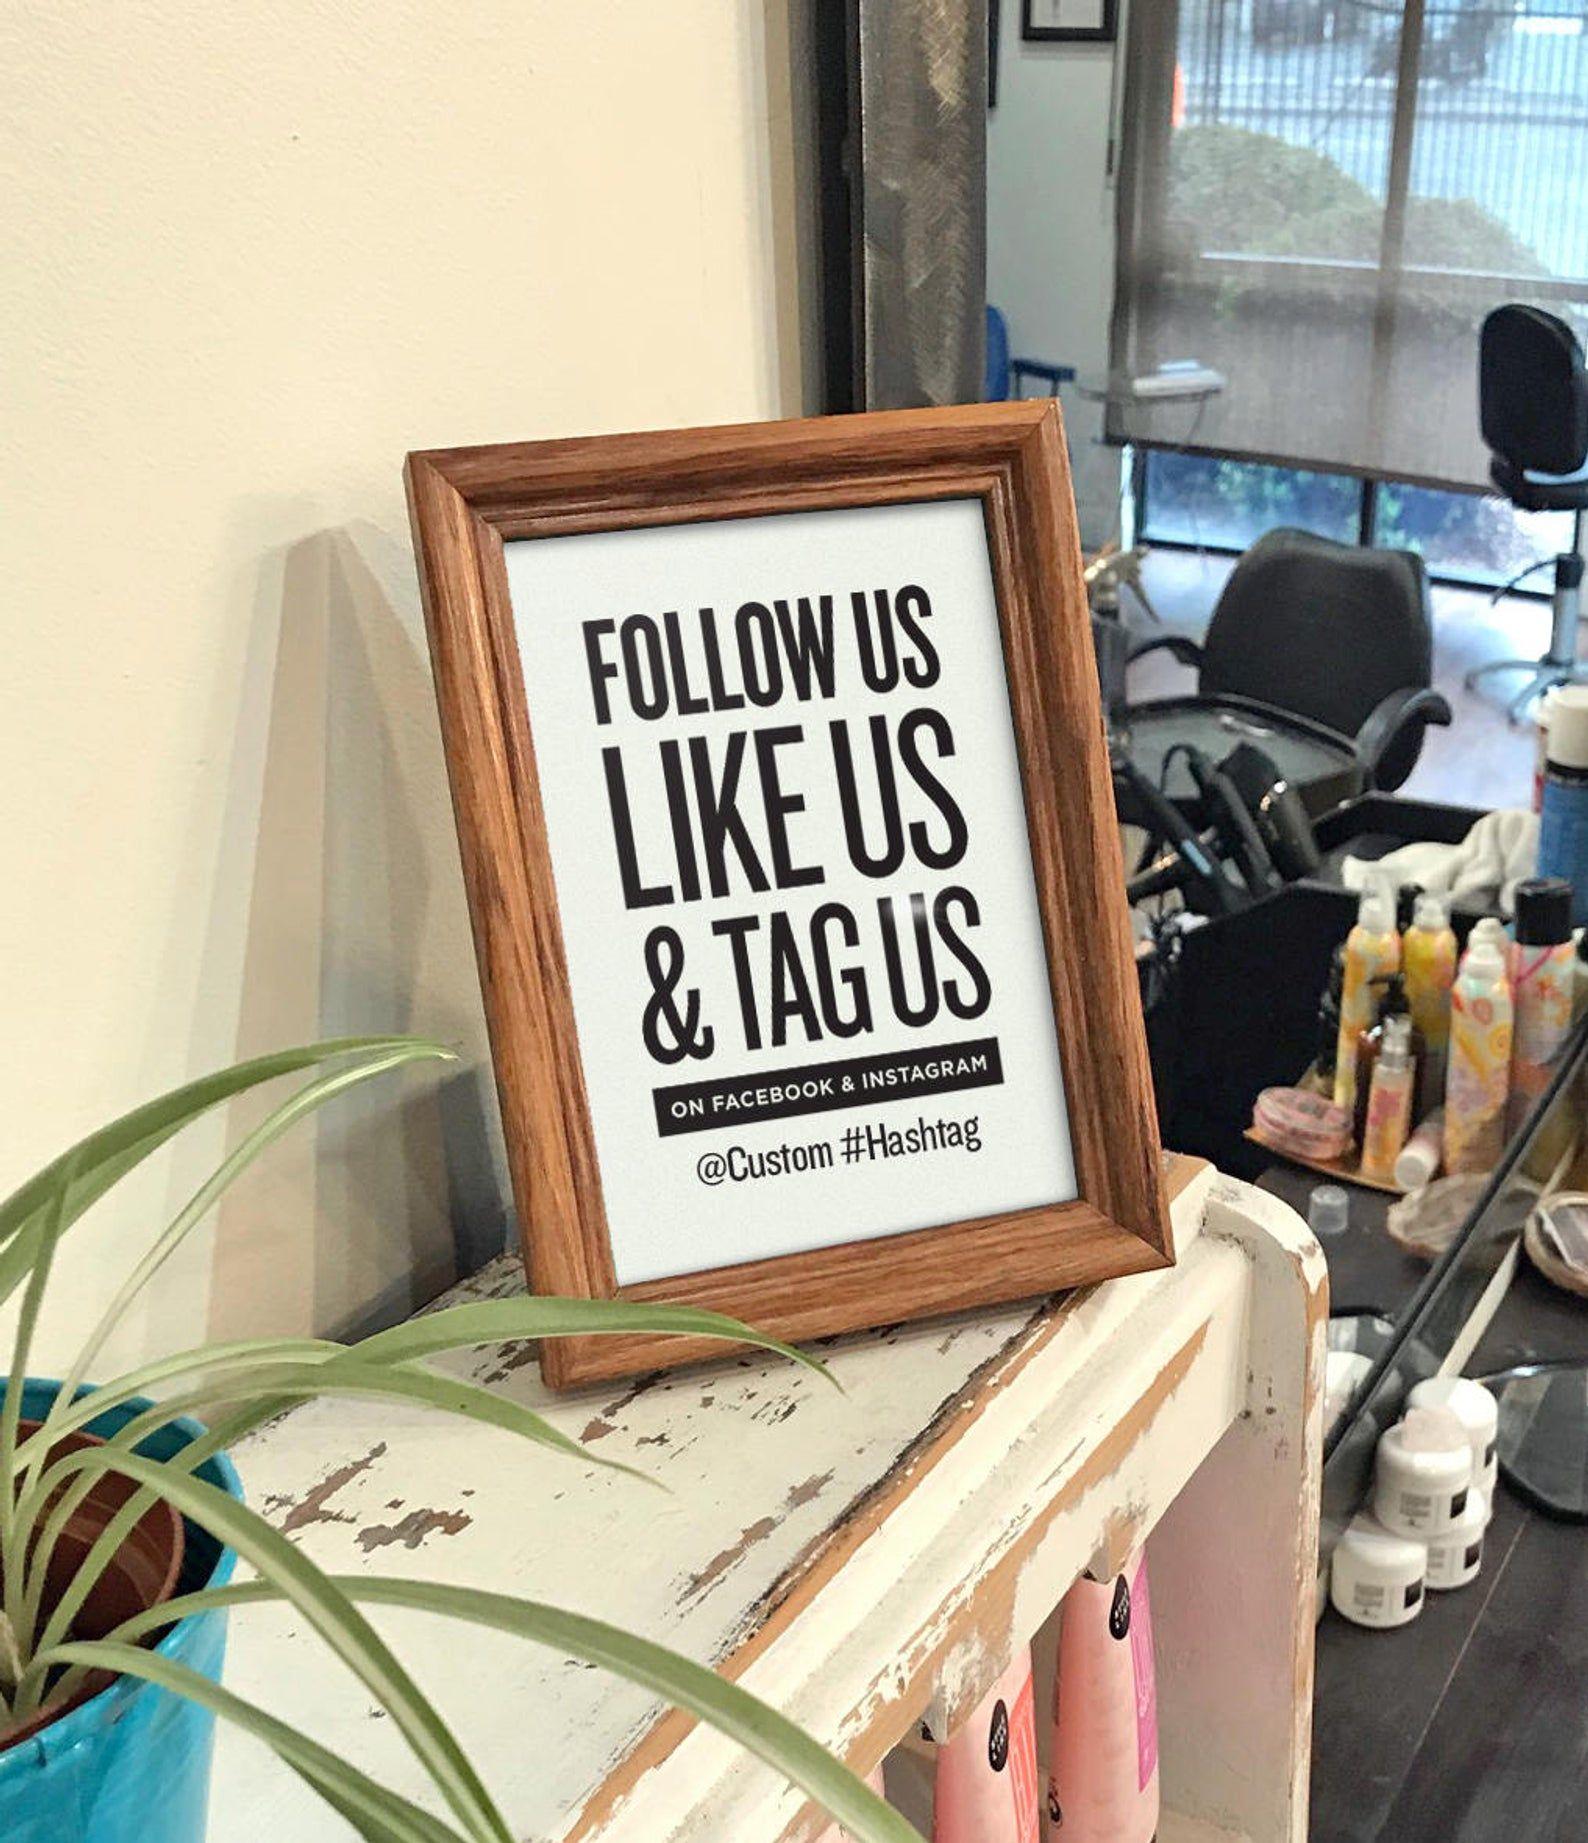 Volg Ons Net Als Wij Tag Ons Op Facebook En Instagram Met Etsy Beauty Salon Decor Salon Decor Nail Salon Decor